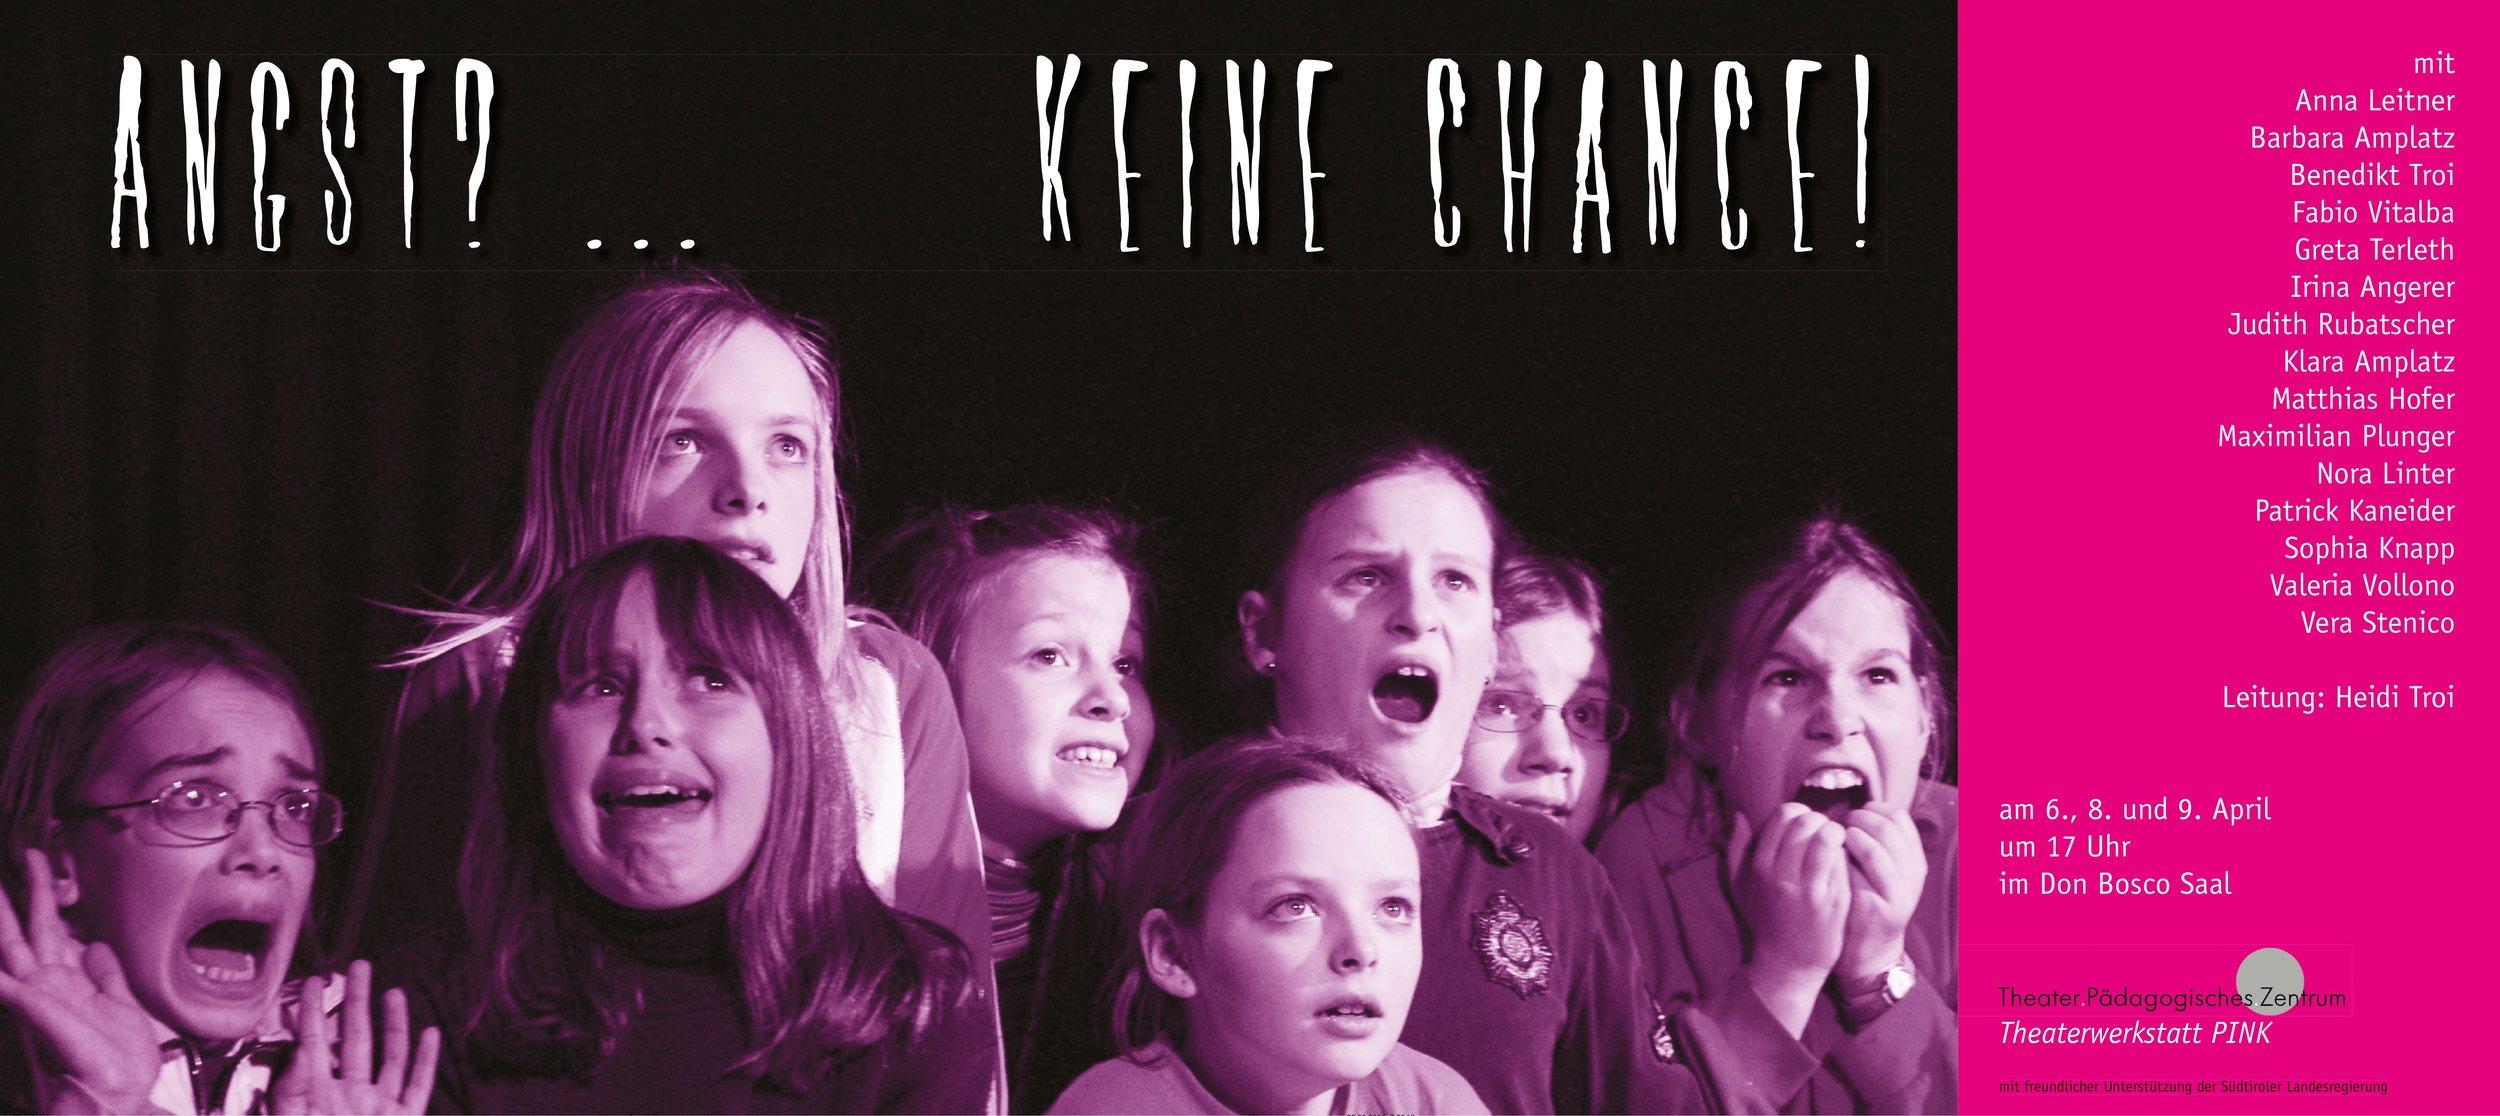 2006-pink-Angst-keine-Chance-Plakat-web.jpg